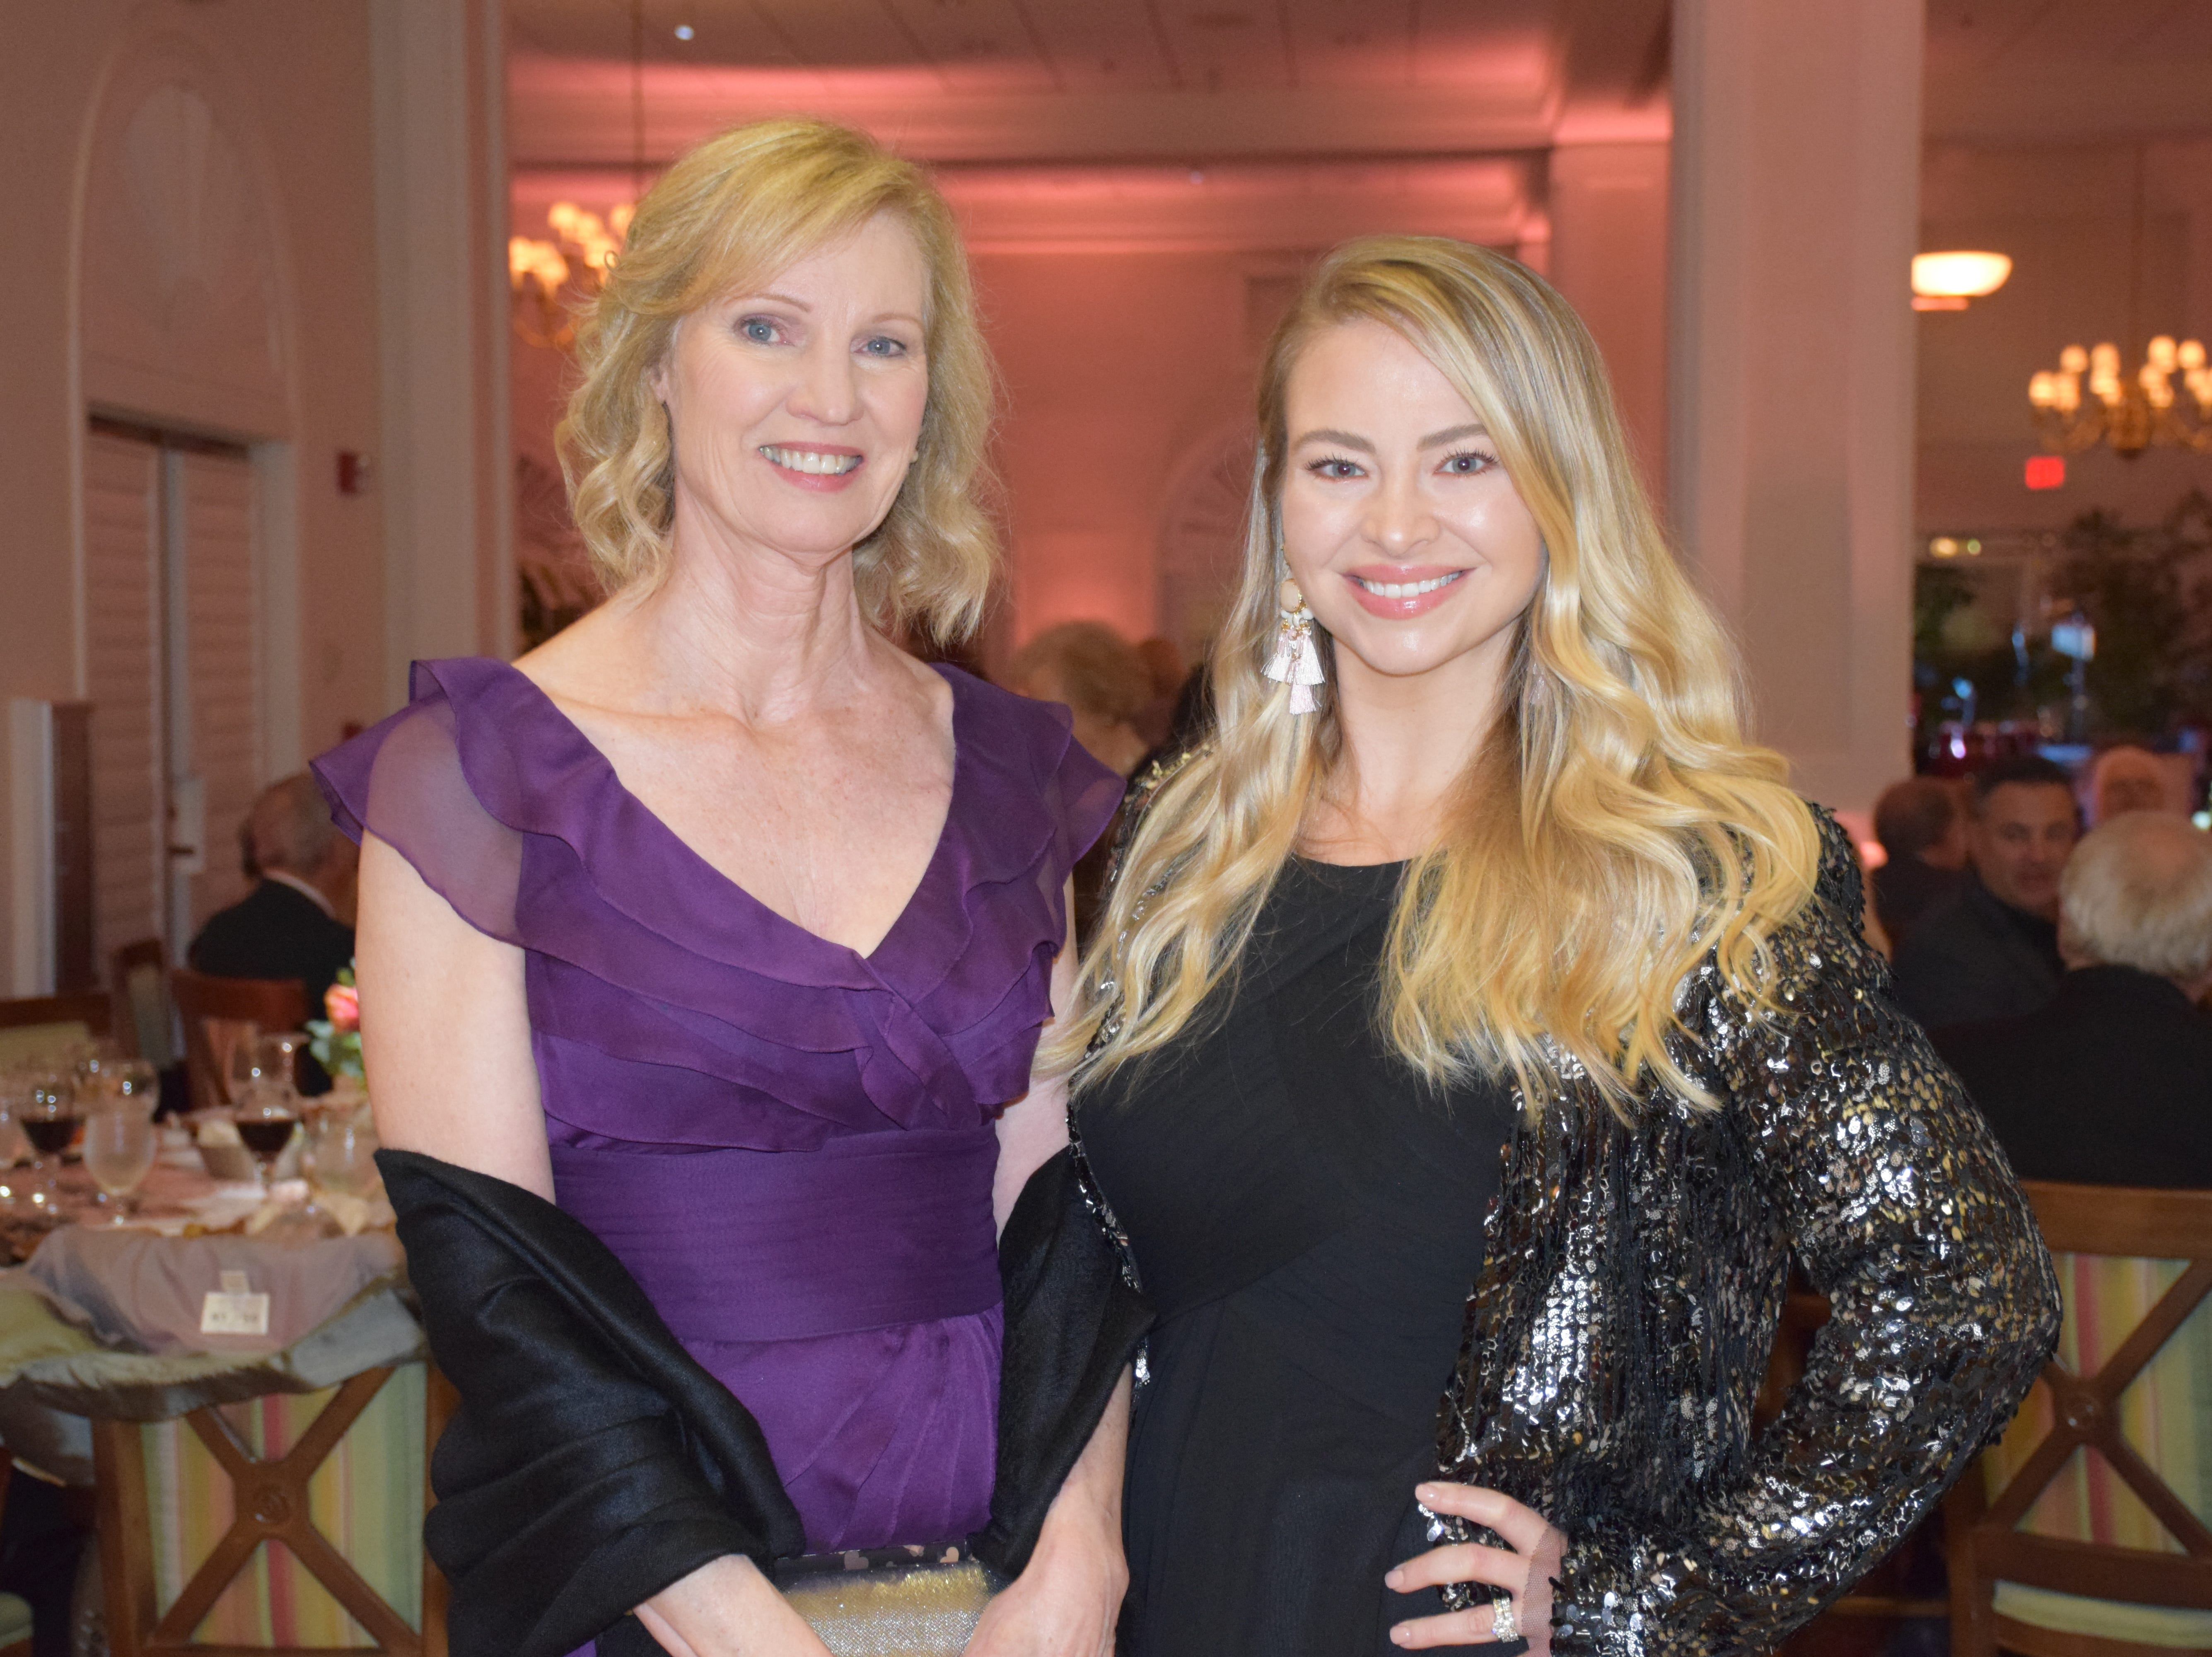 Stephanie and Samantha Whitley